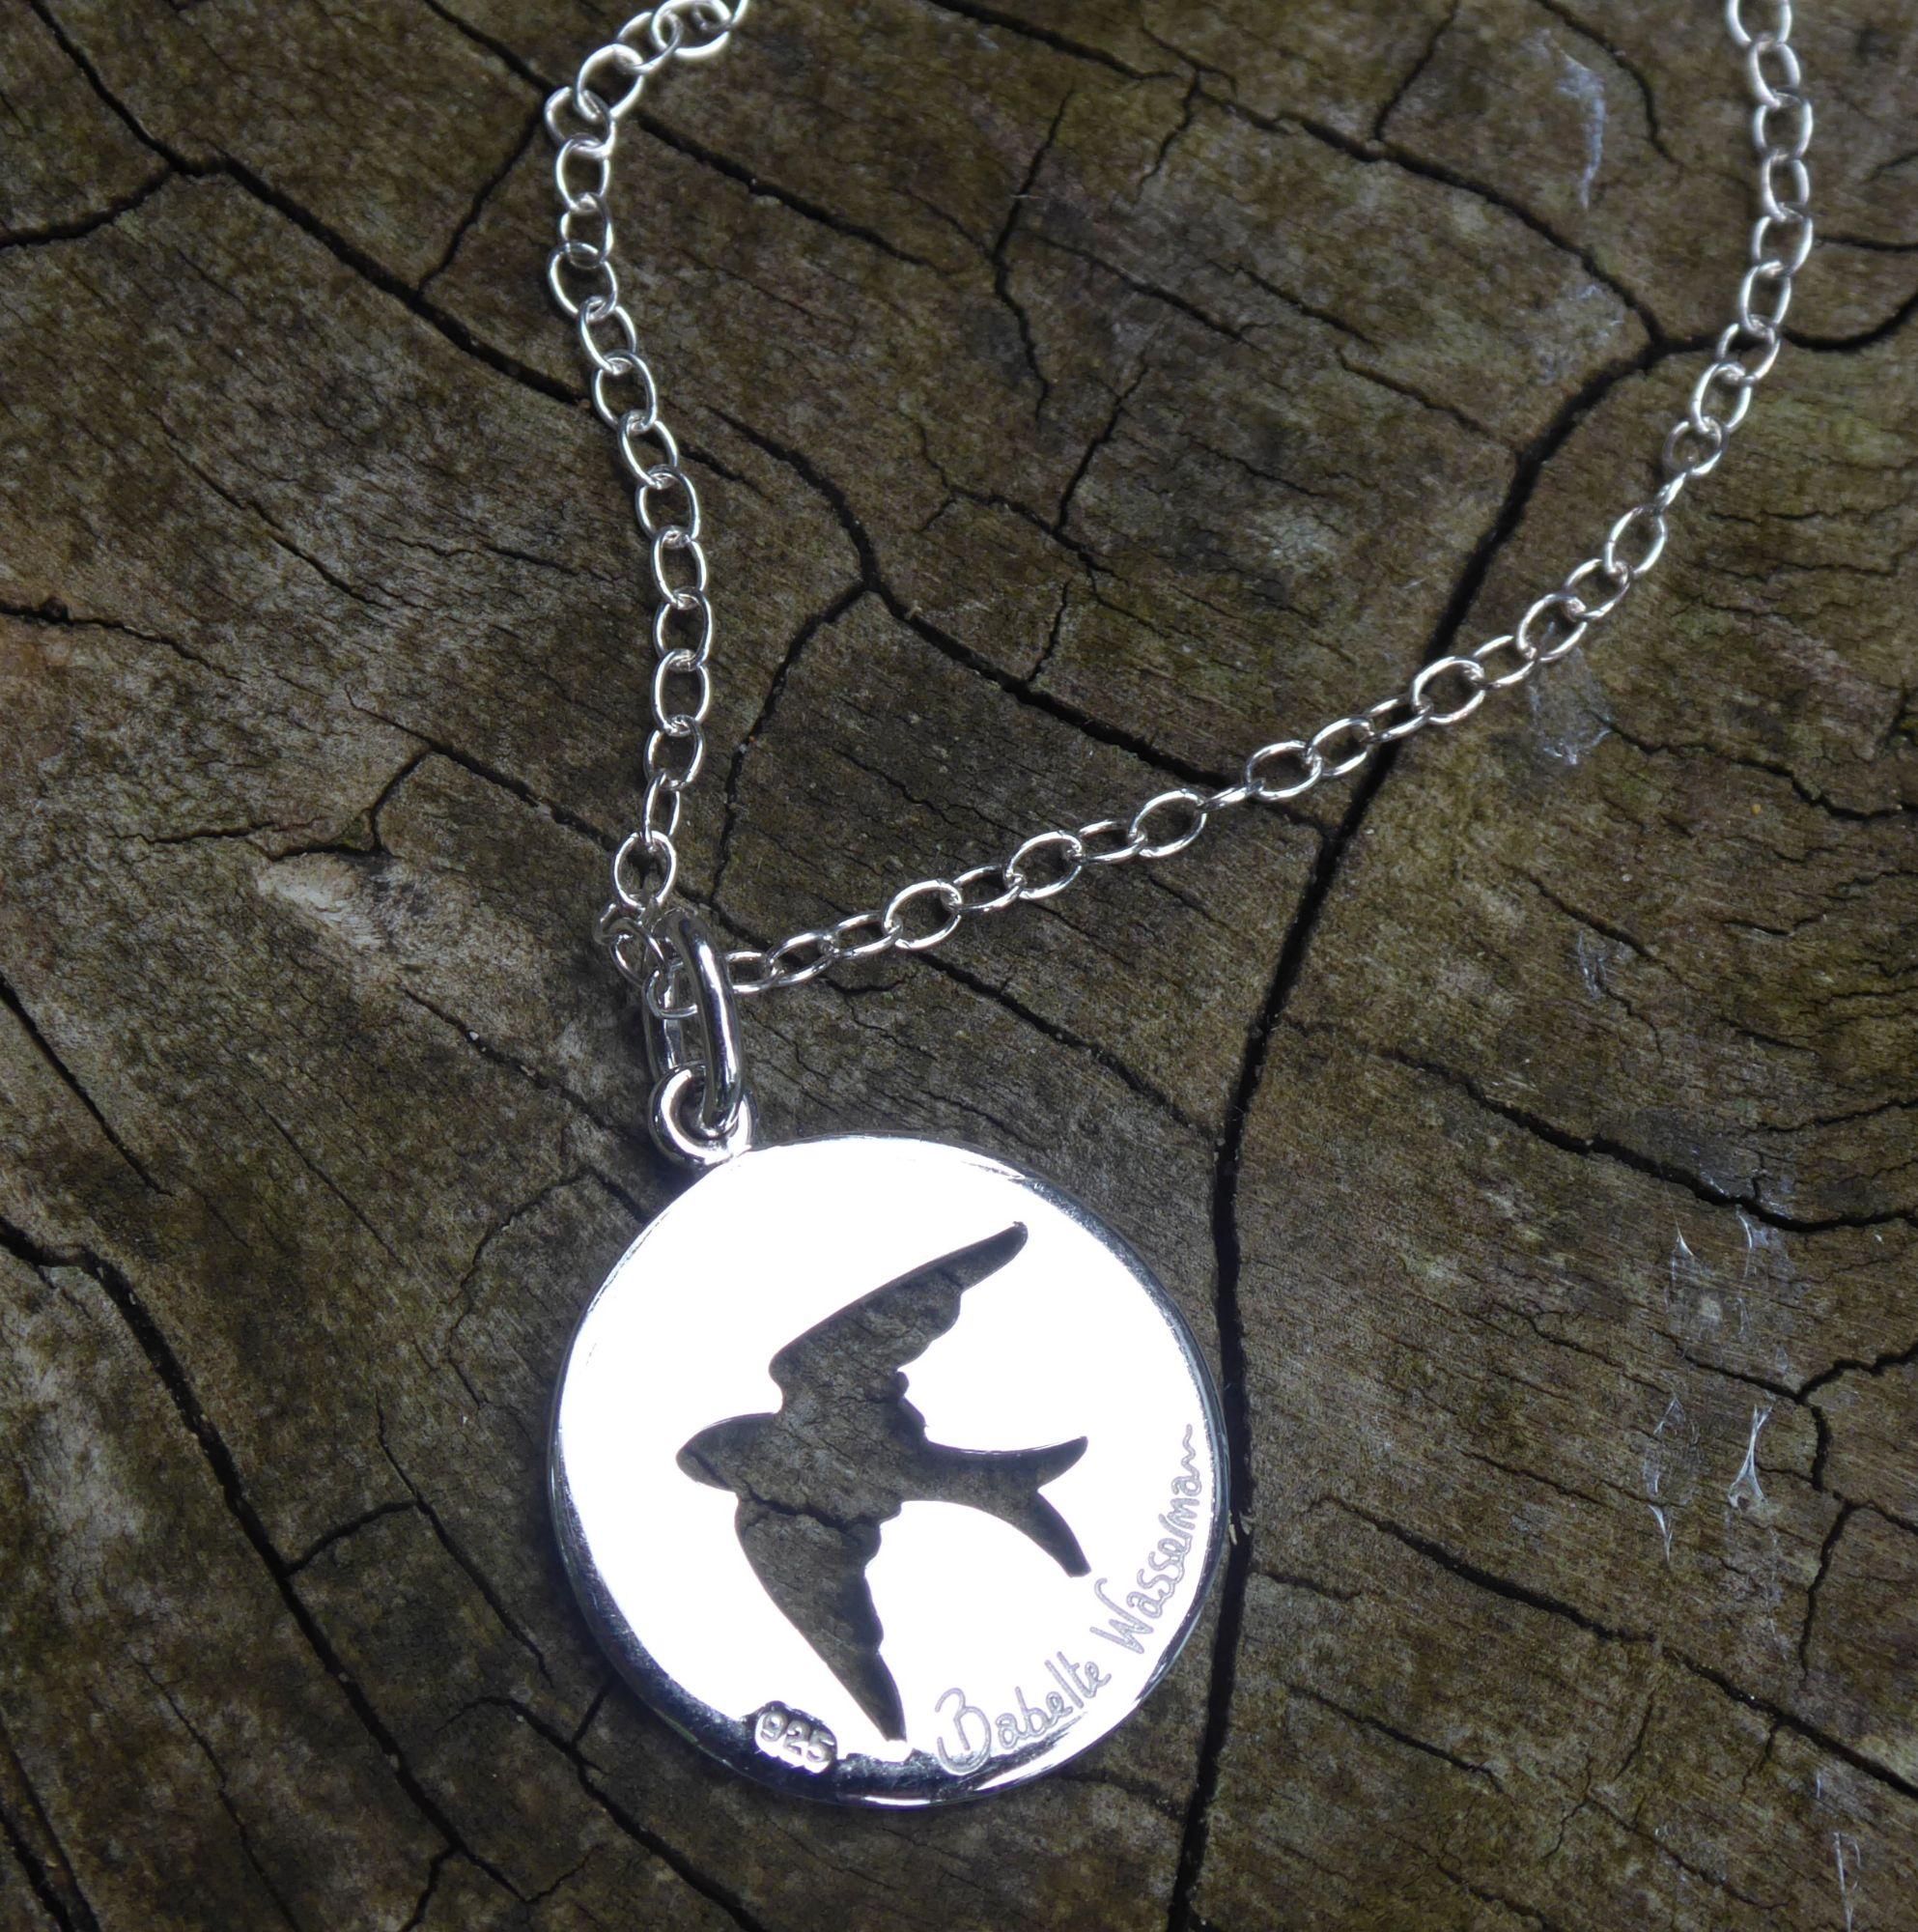 Silver swallow pendant